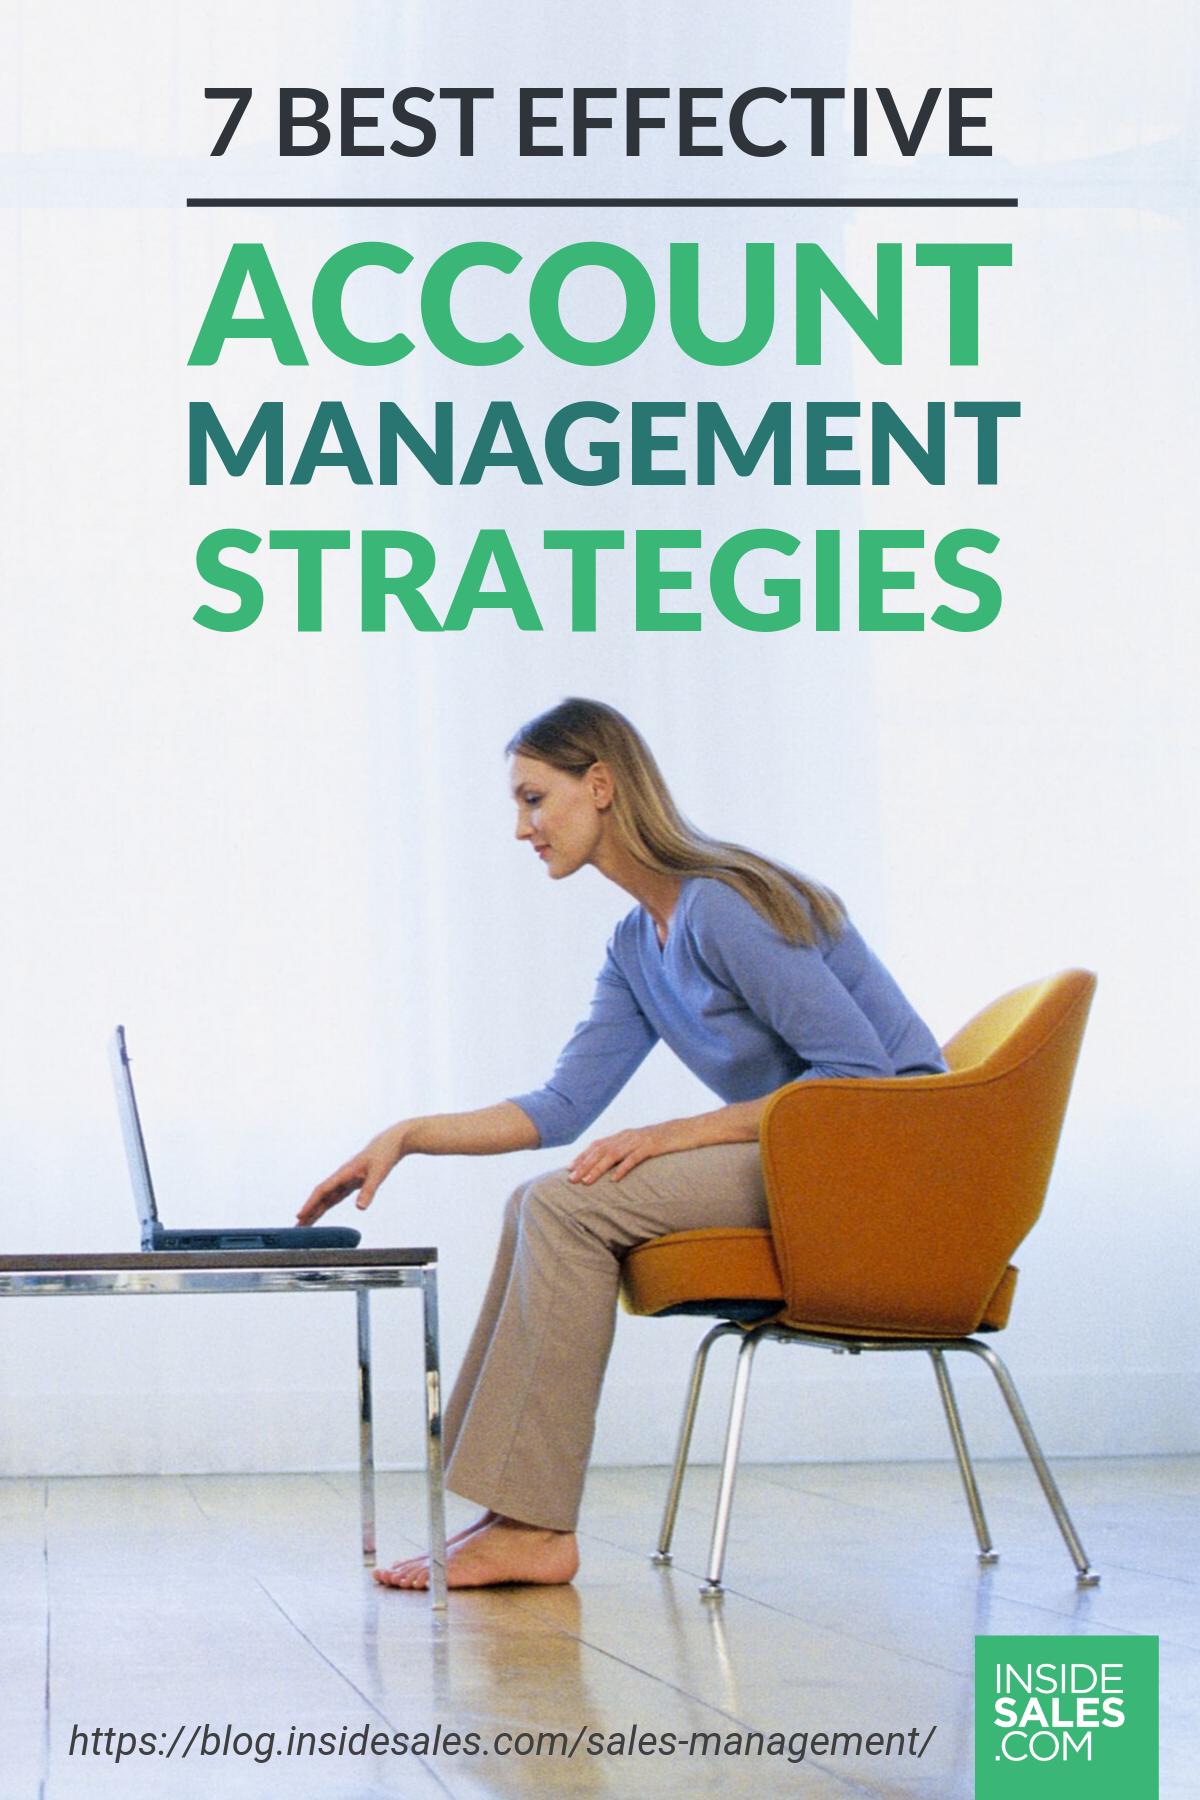 7 Best Effective Account Management Strategies https://www.xant.ai/blog/sales-management/management-strategies-key-accounts/